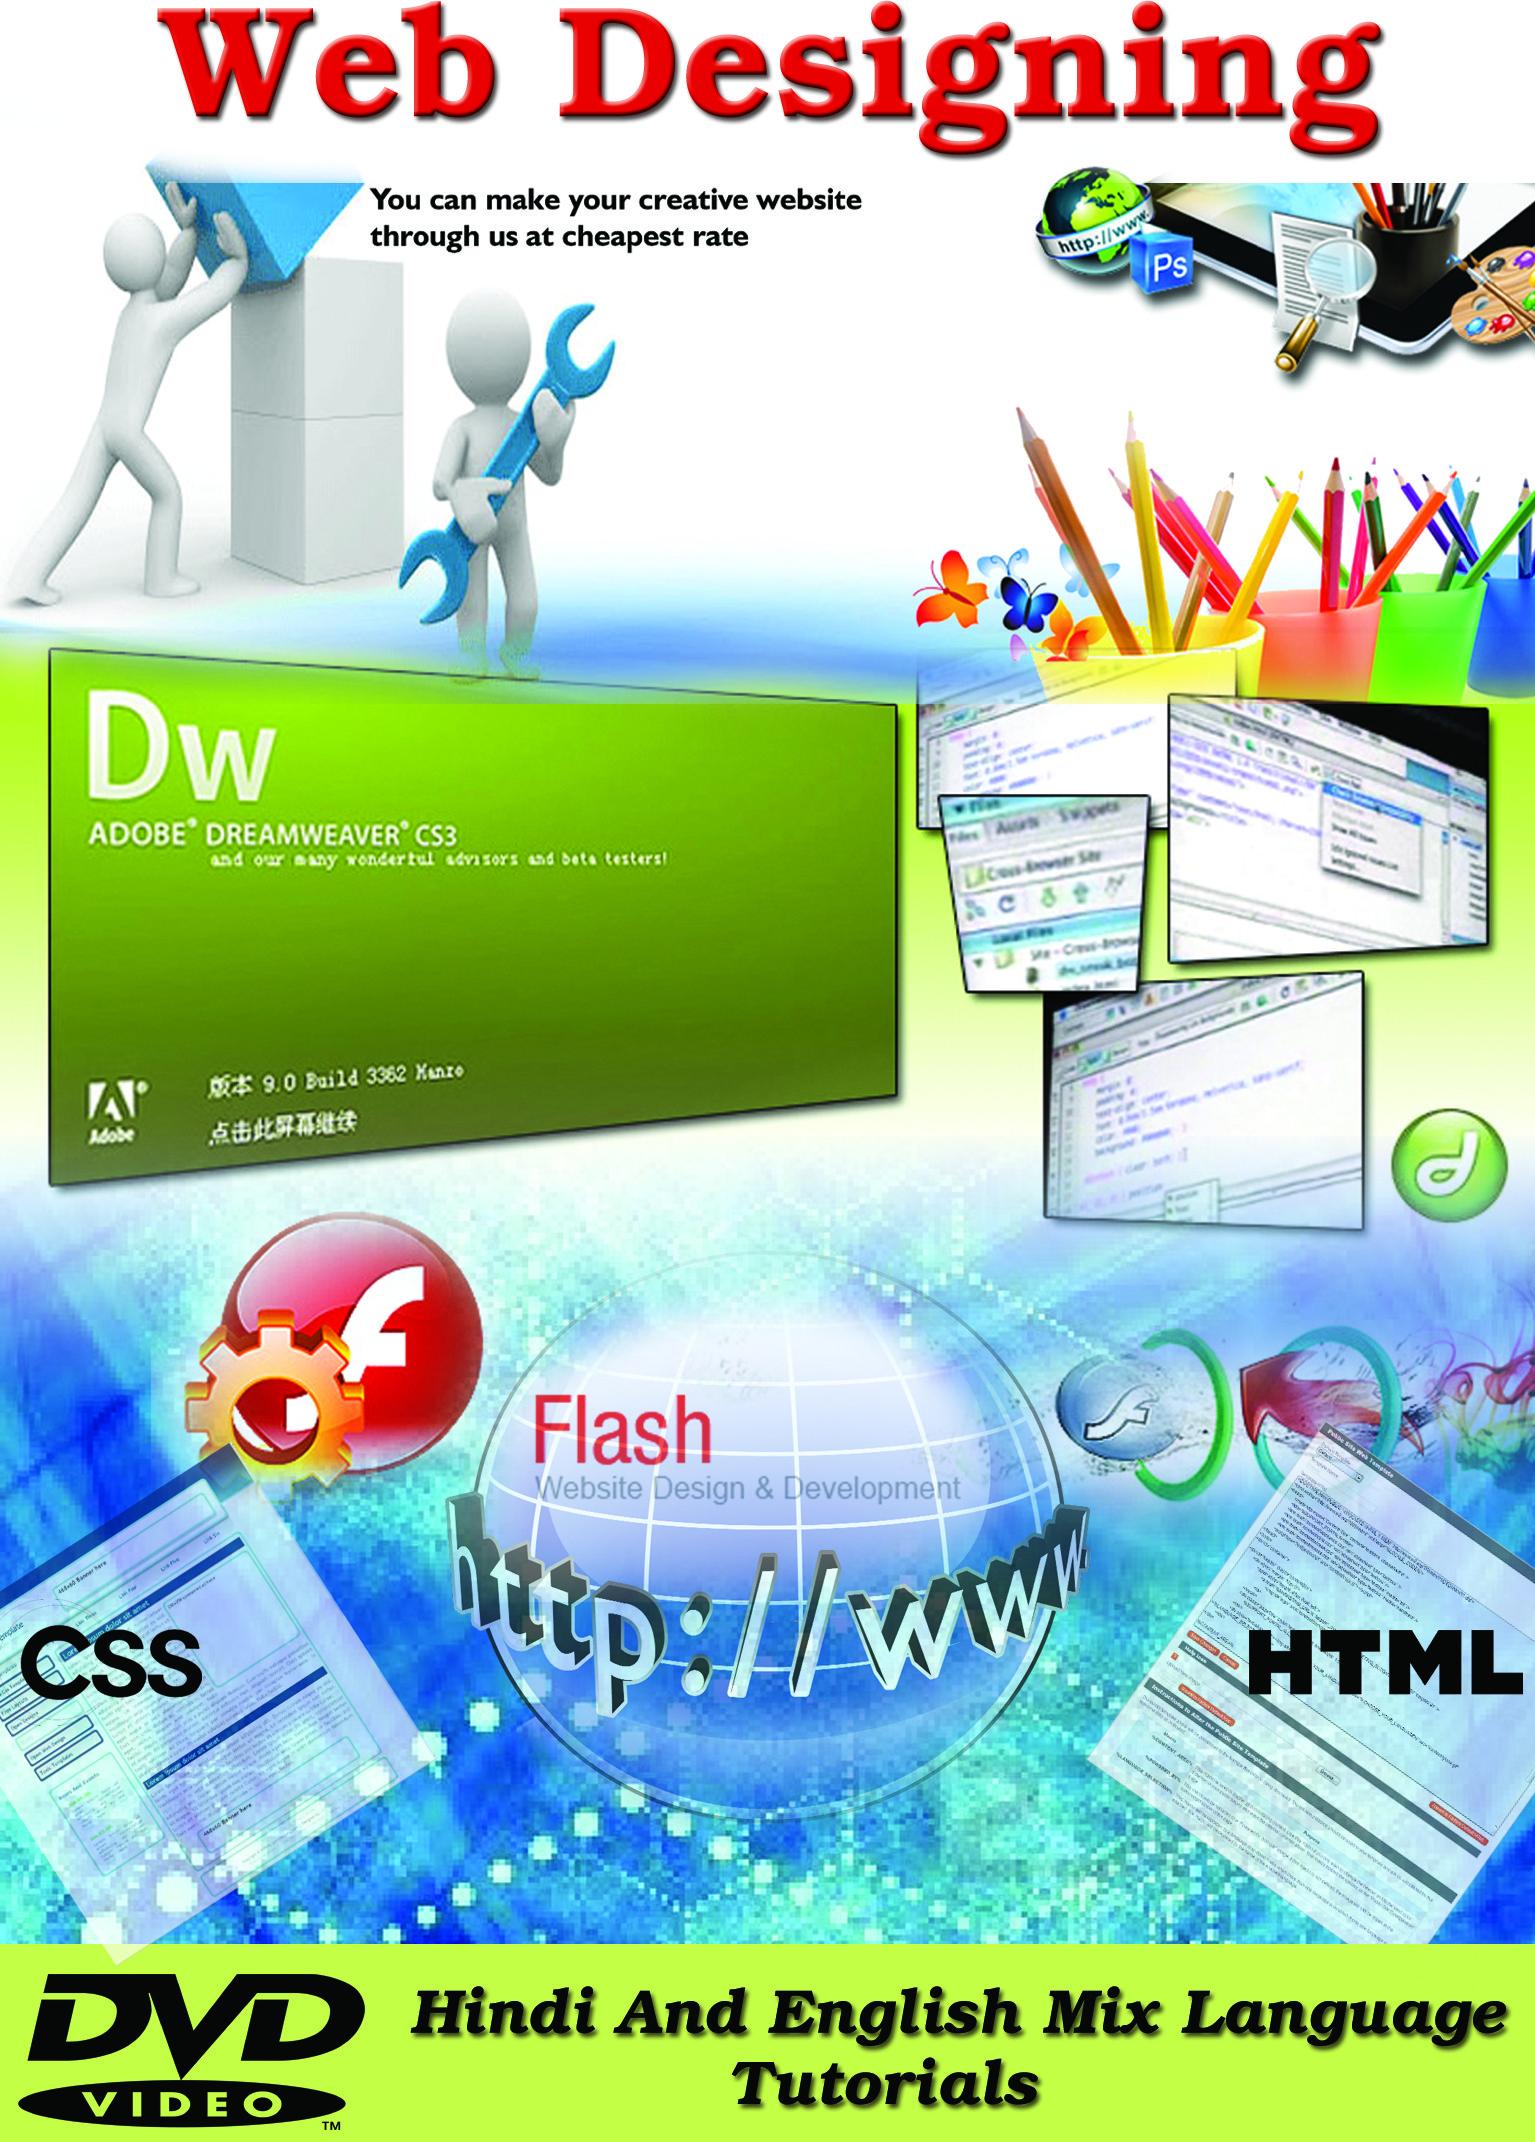 Lsoit Search Engine Optimisation Tutorials DVD(DVD)